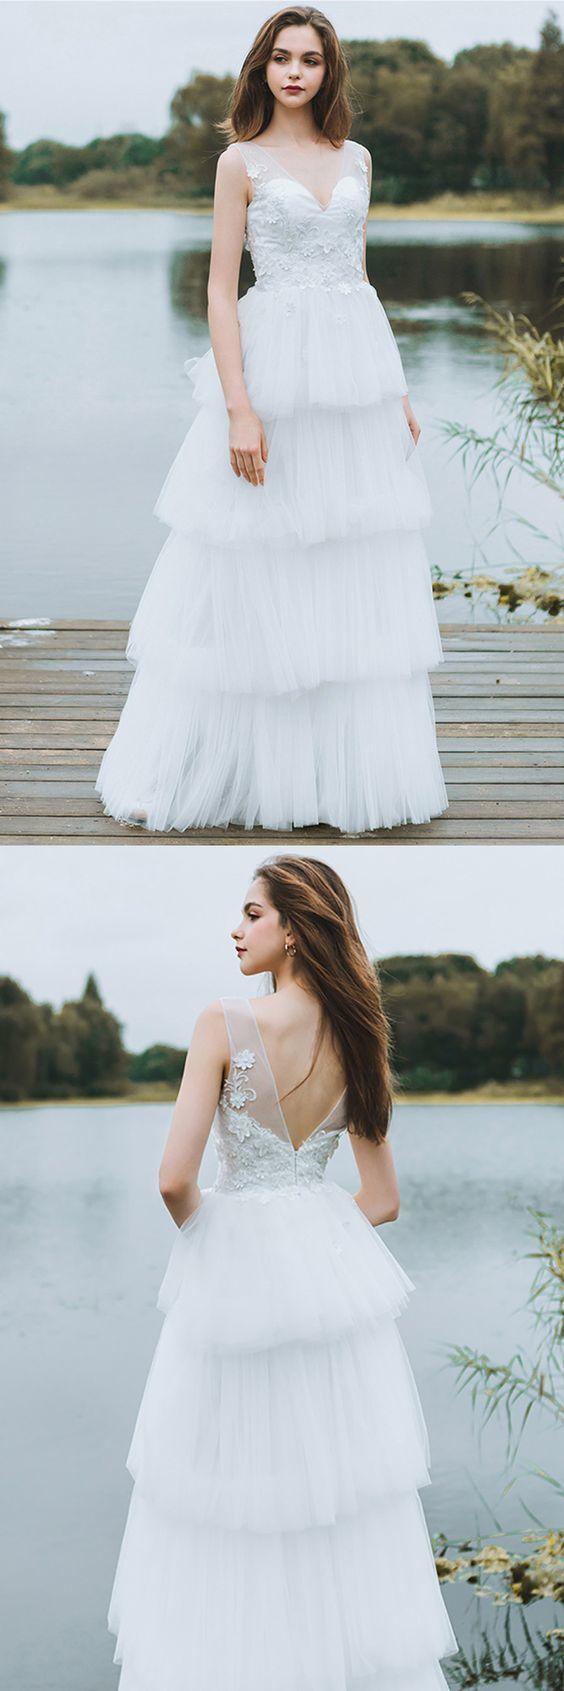 Unique tiered tulle low back boho wedding dress beach weddings long